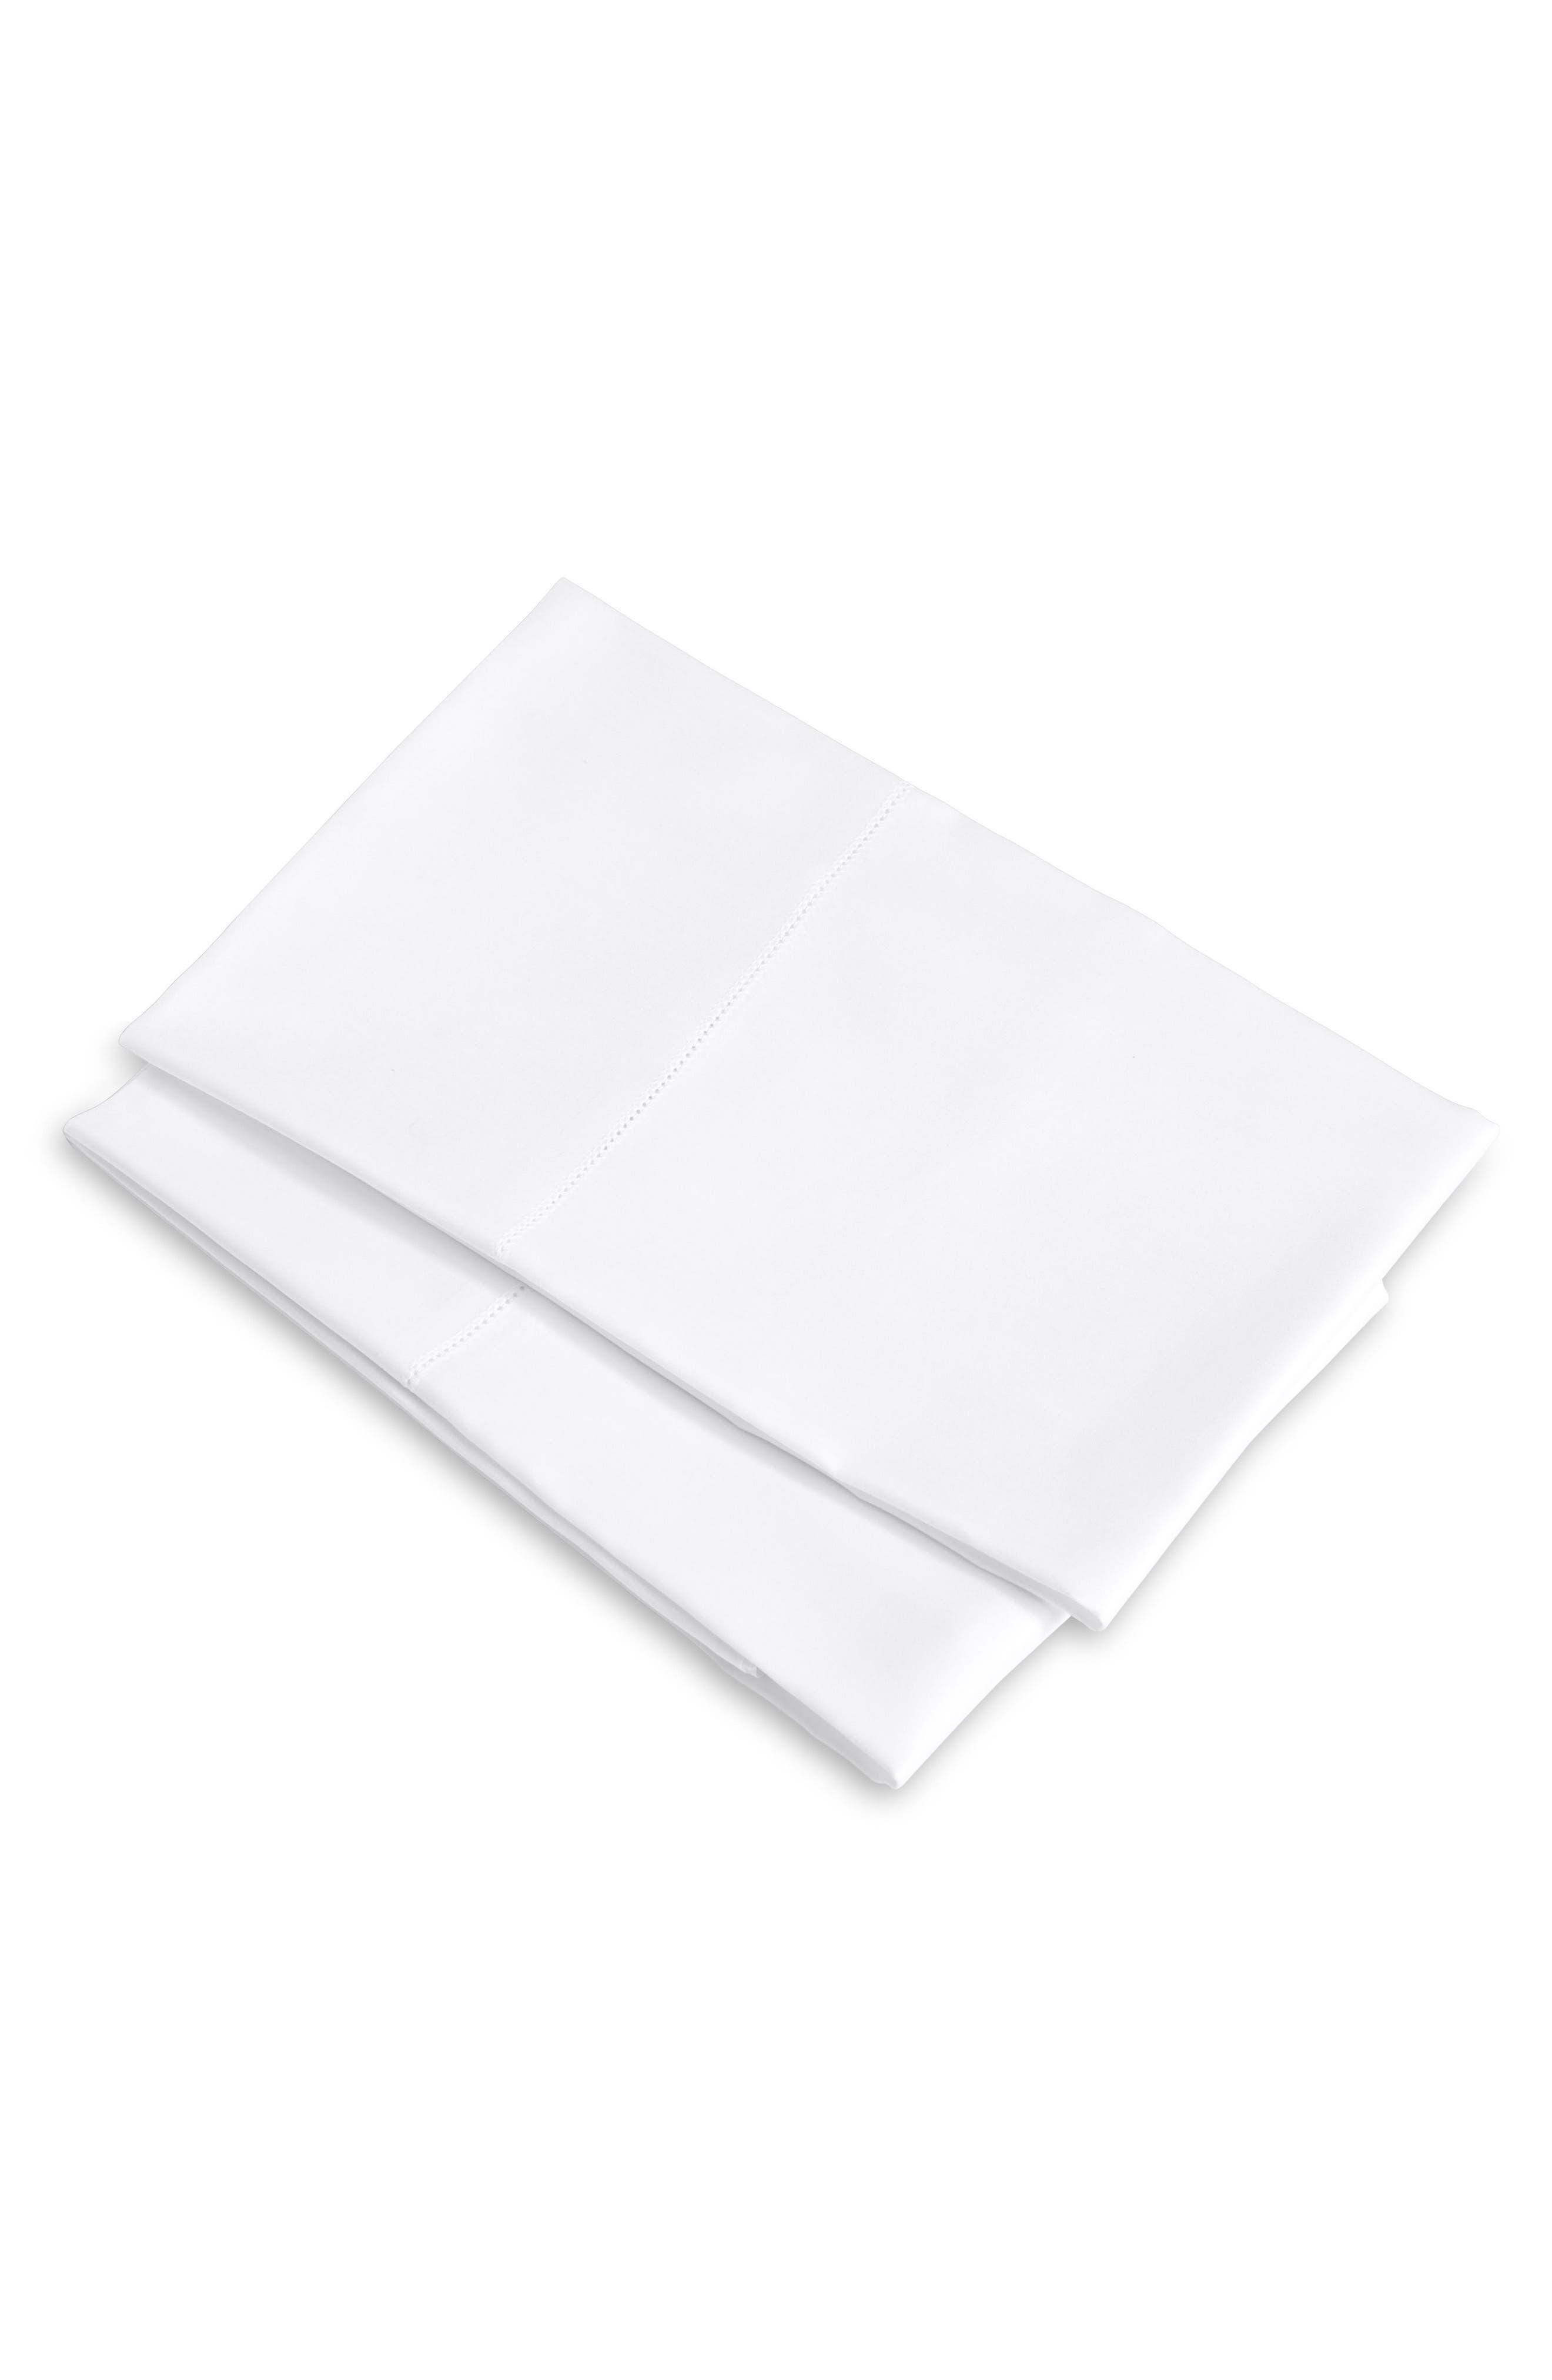 SIGNORIA FIRENZE, Tuscan Dreams 400 Thread Count Set of 2 Pillowcases, Main thumbnail 1, color, WHITE